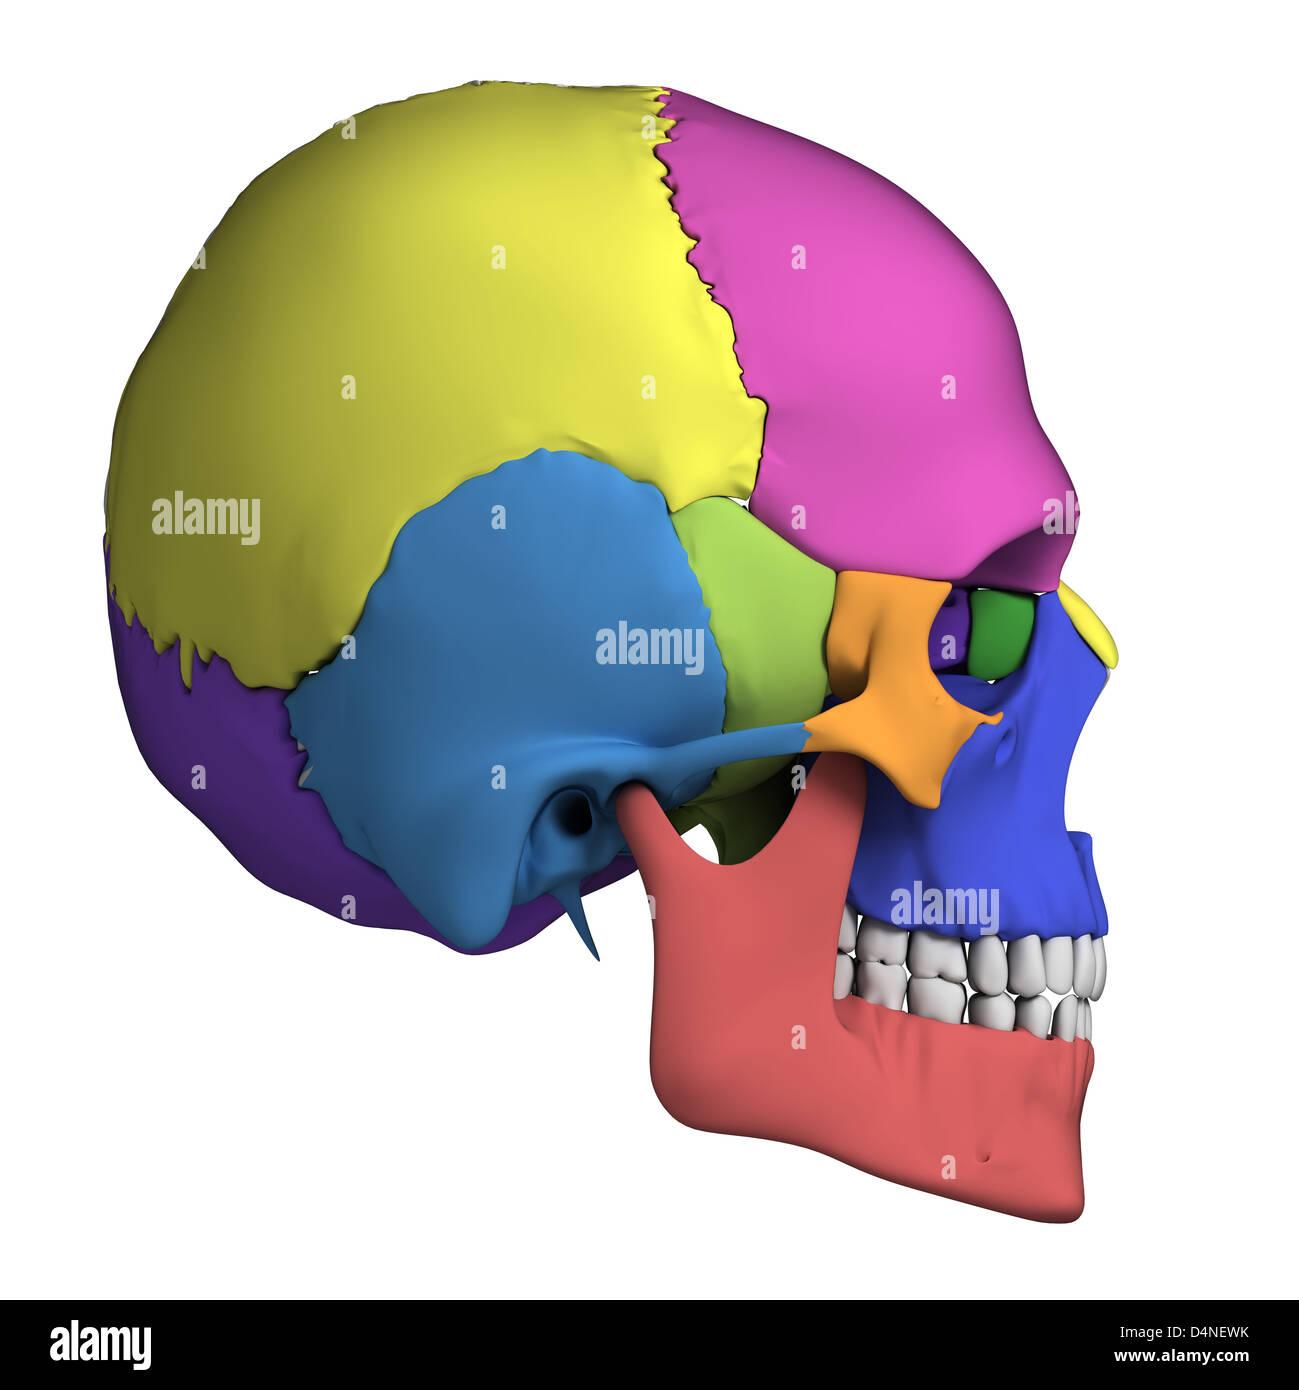 Human Skull Anatomy Stock Photo 54562415 Alamy